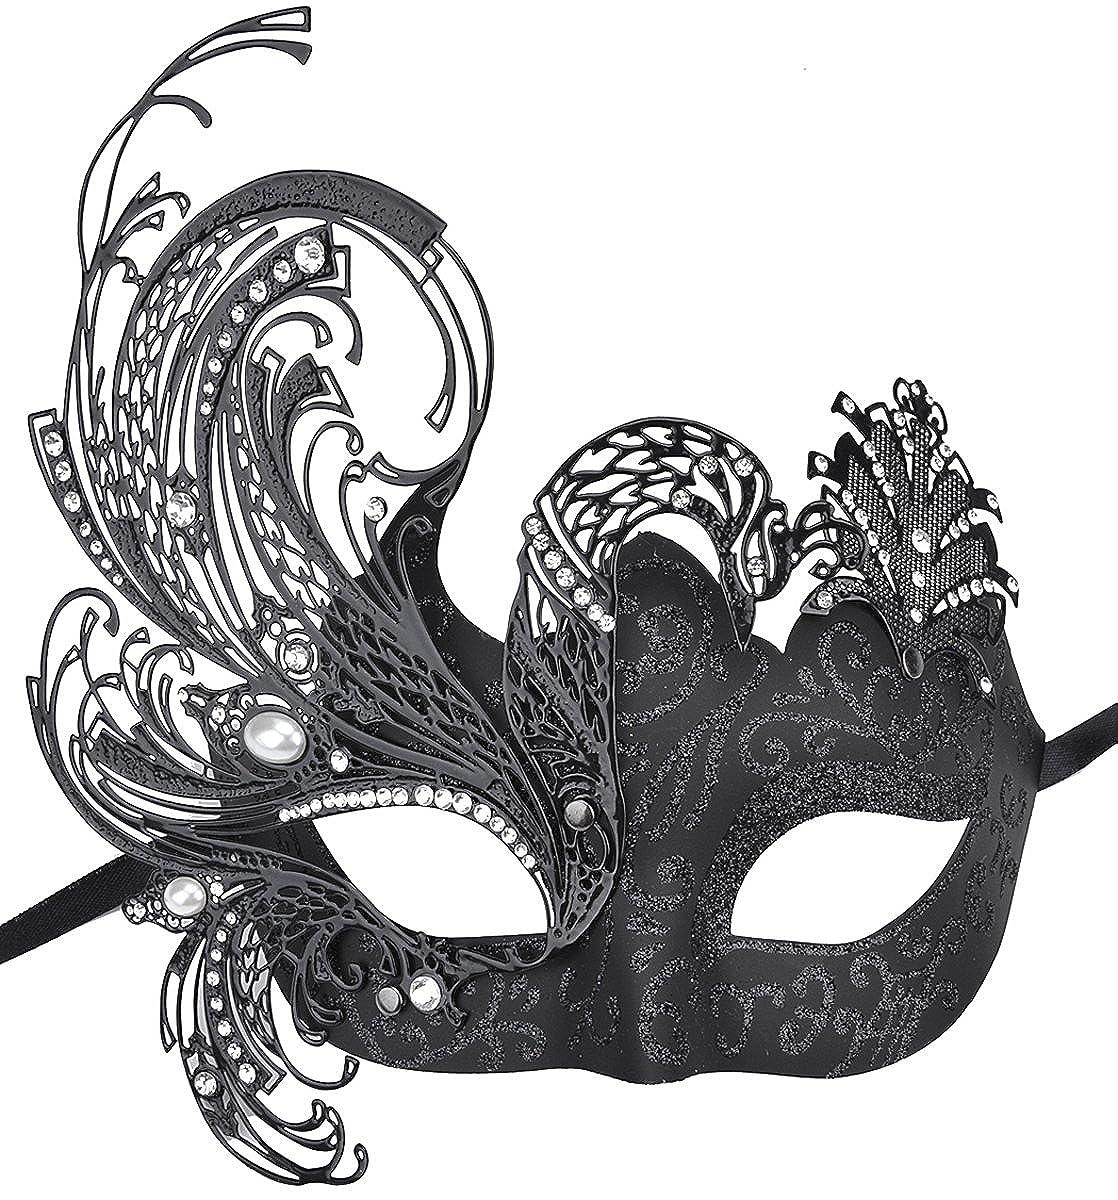 Coxeer Womens Masquerade Mask Swan Halloween Venetian Mask Metal Filigree Mask Z150208B1OQS151